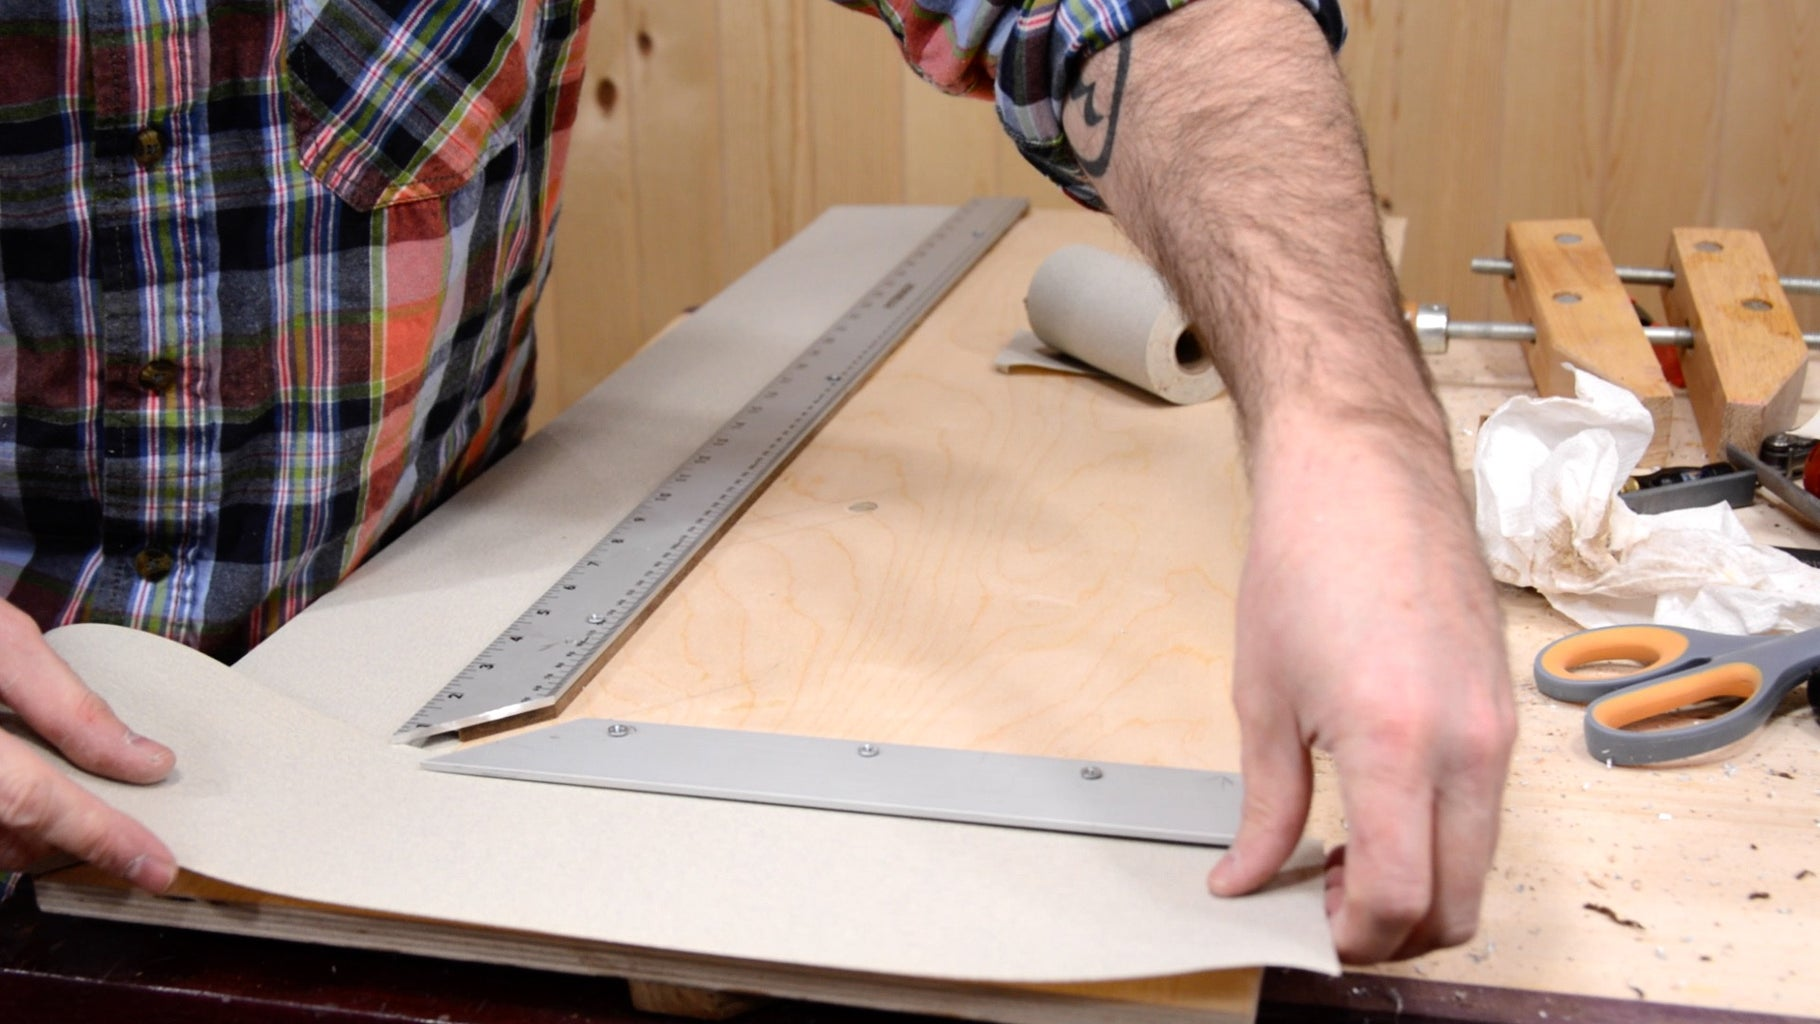 Step 16: Add Sandpaper Grip